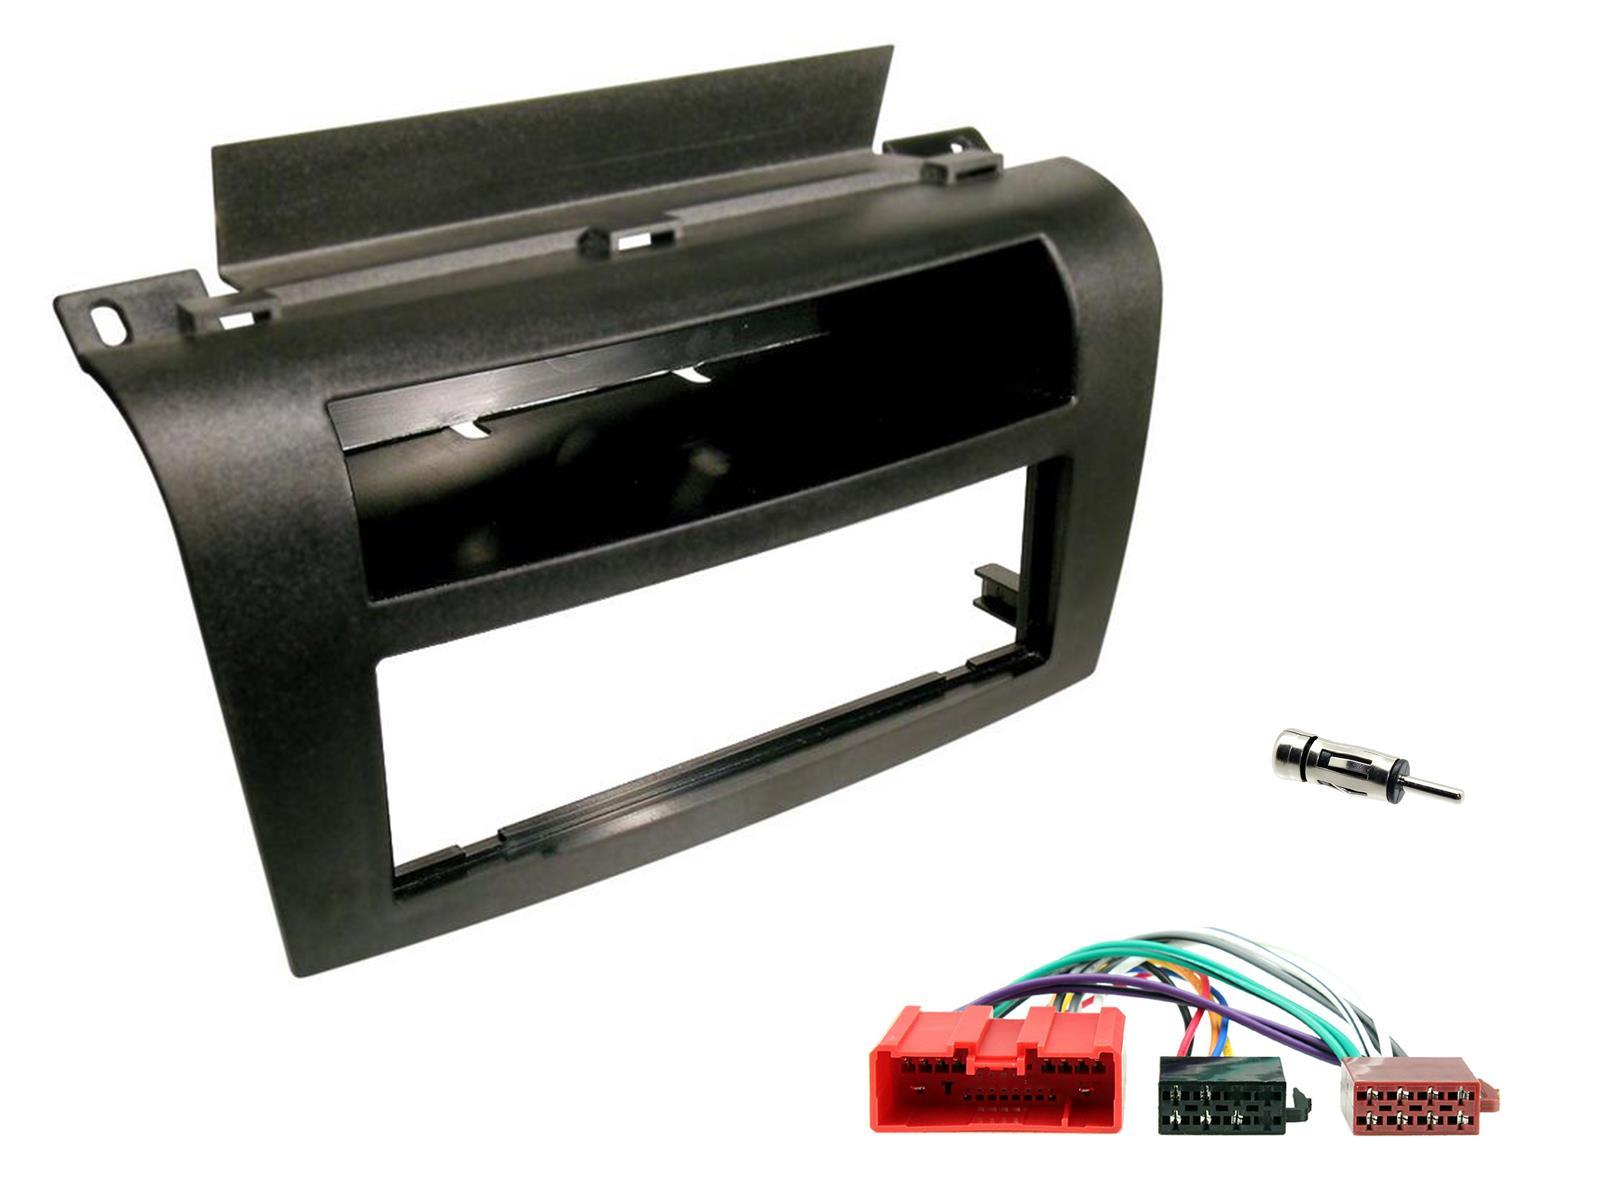 CTKMZ01-ISO Single Din Fascia Fitting Kit for Mazda 3 2005-2009